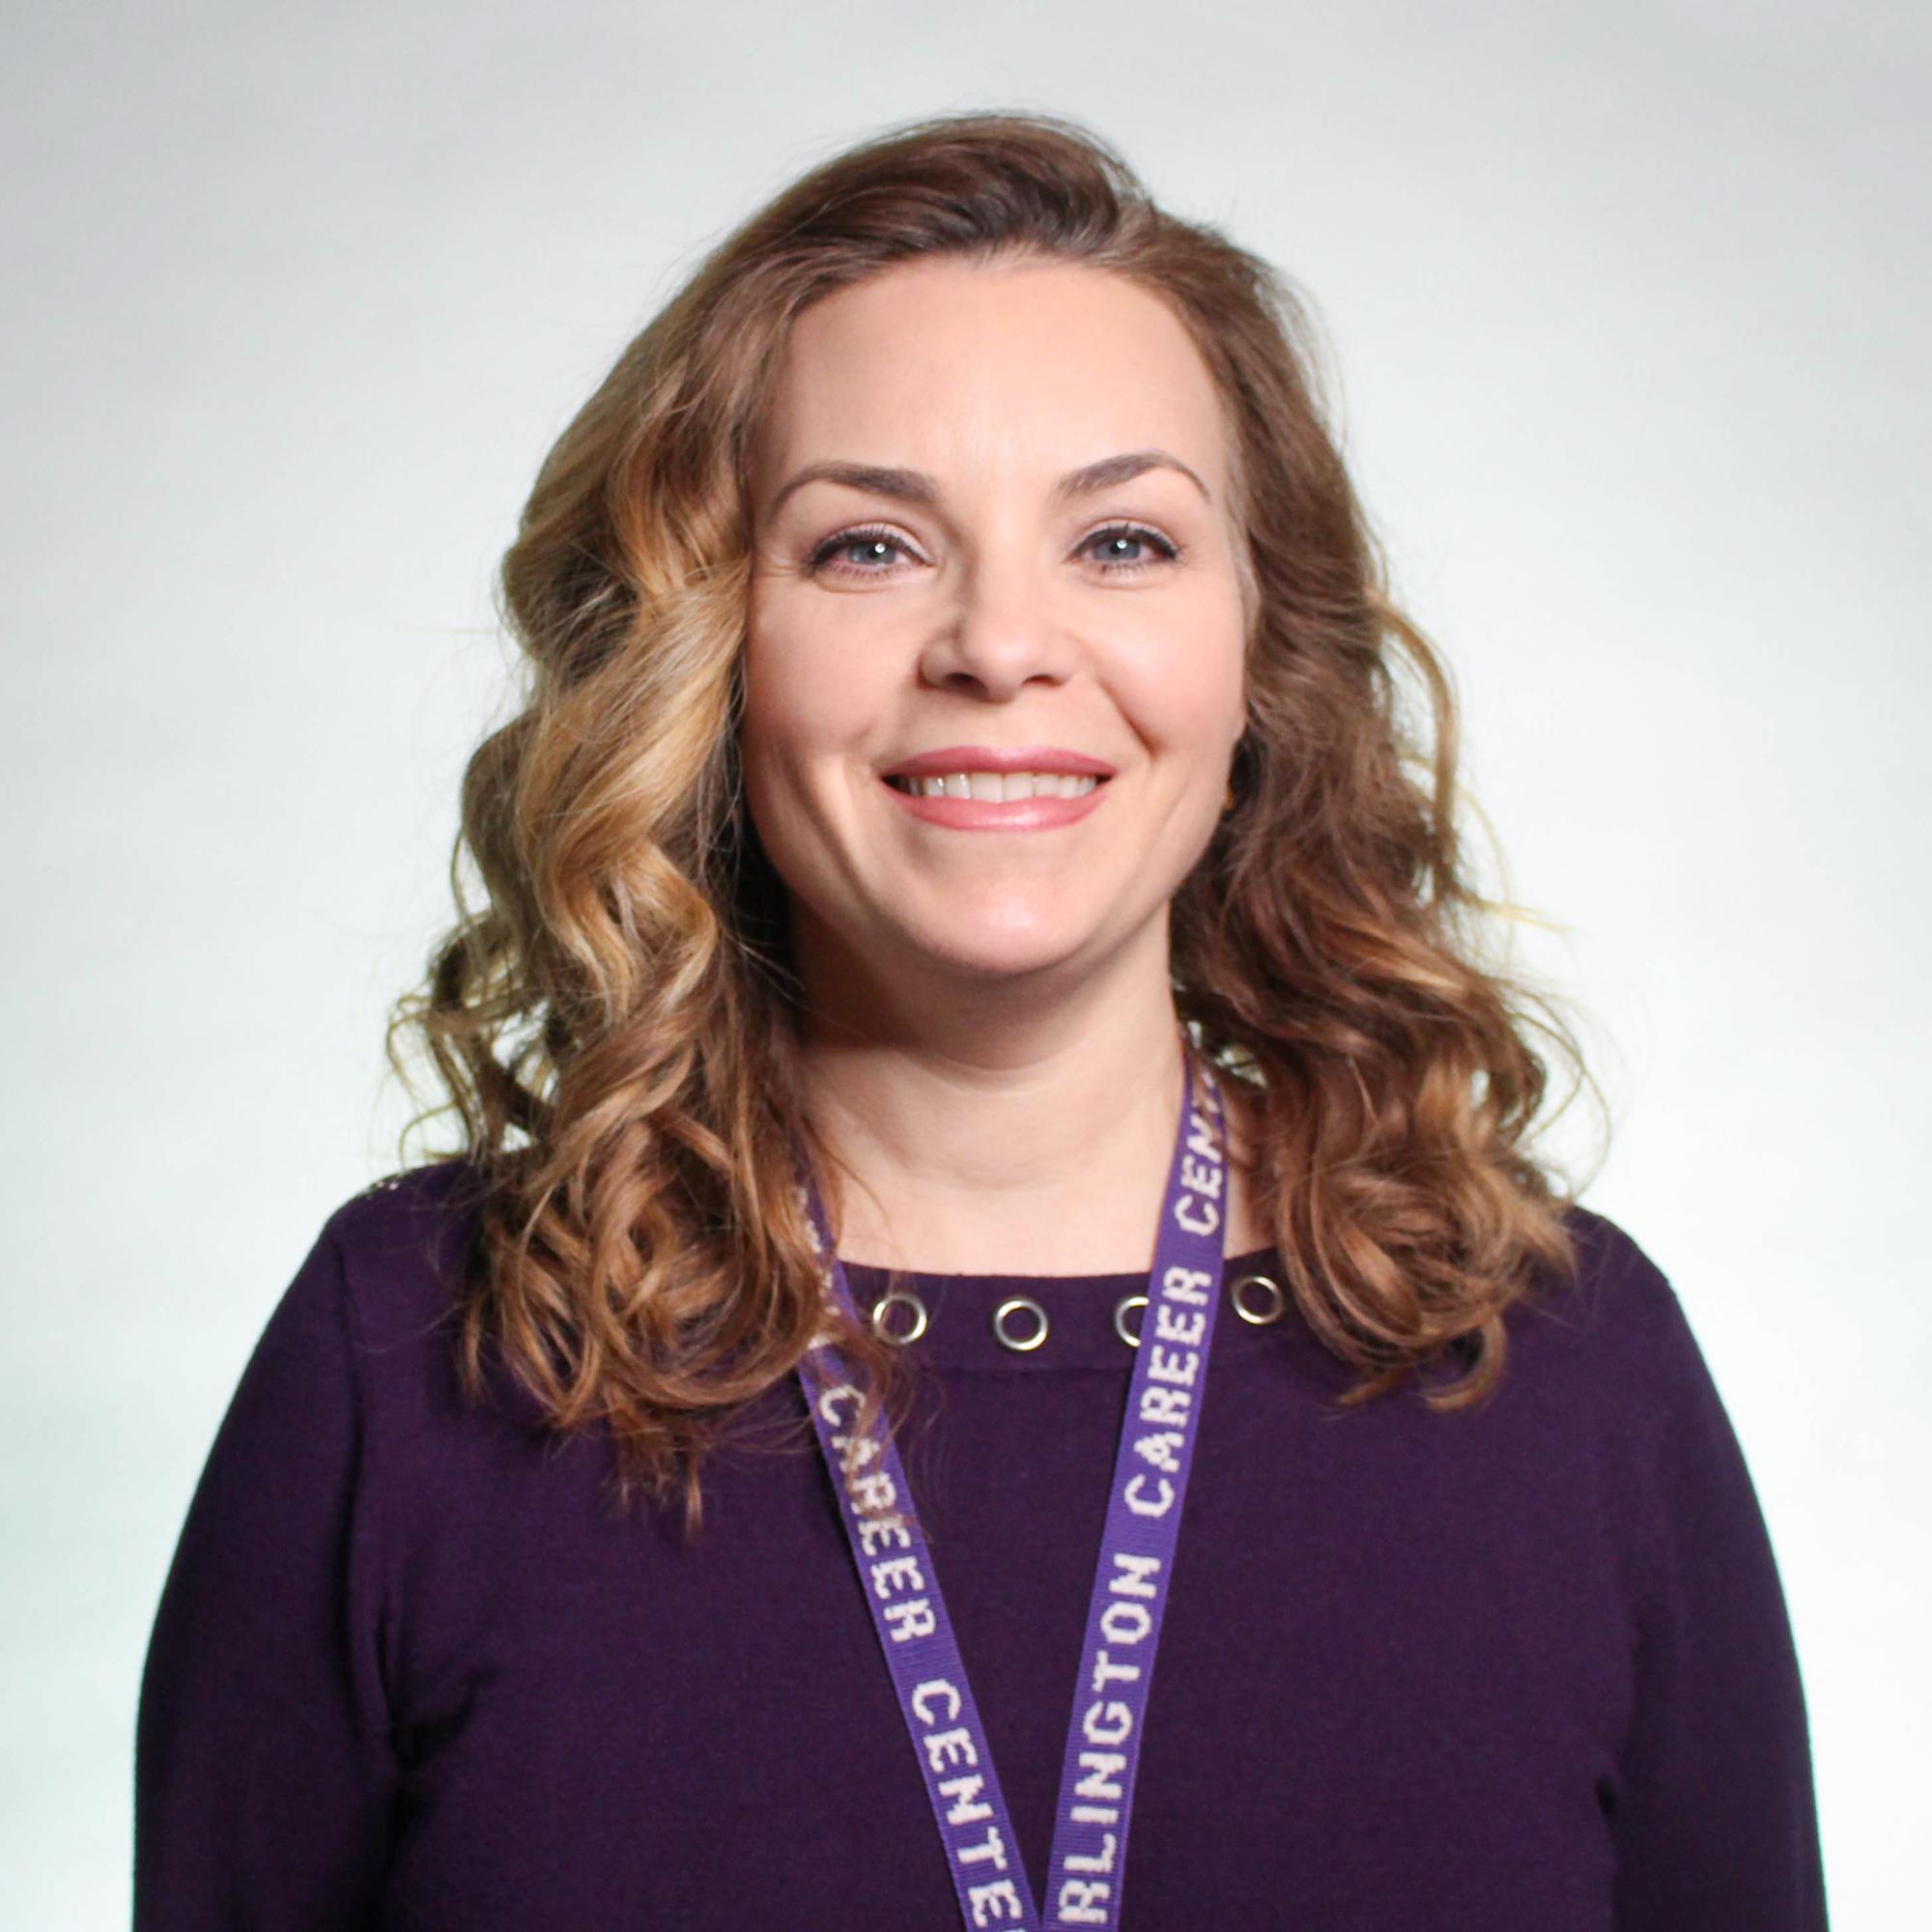 Ms. Lisa Pellegrino